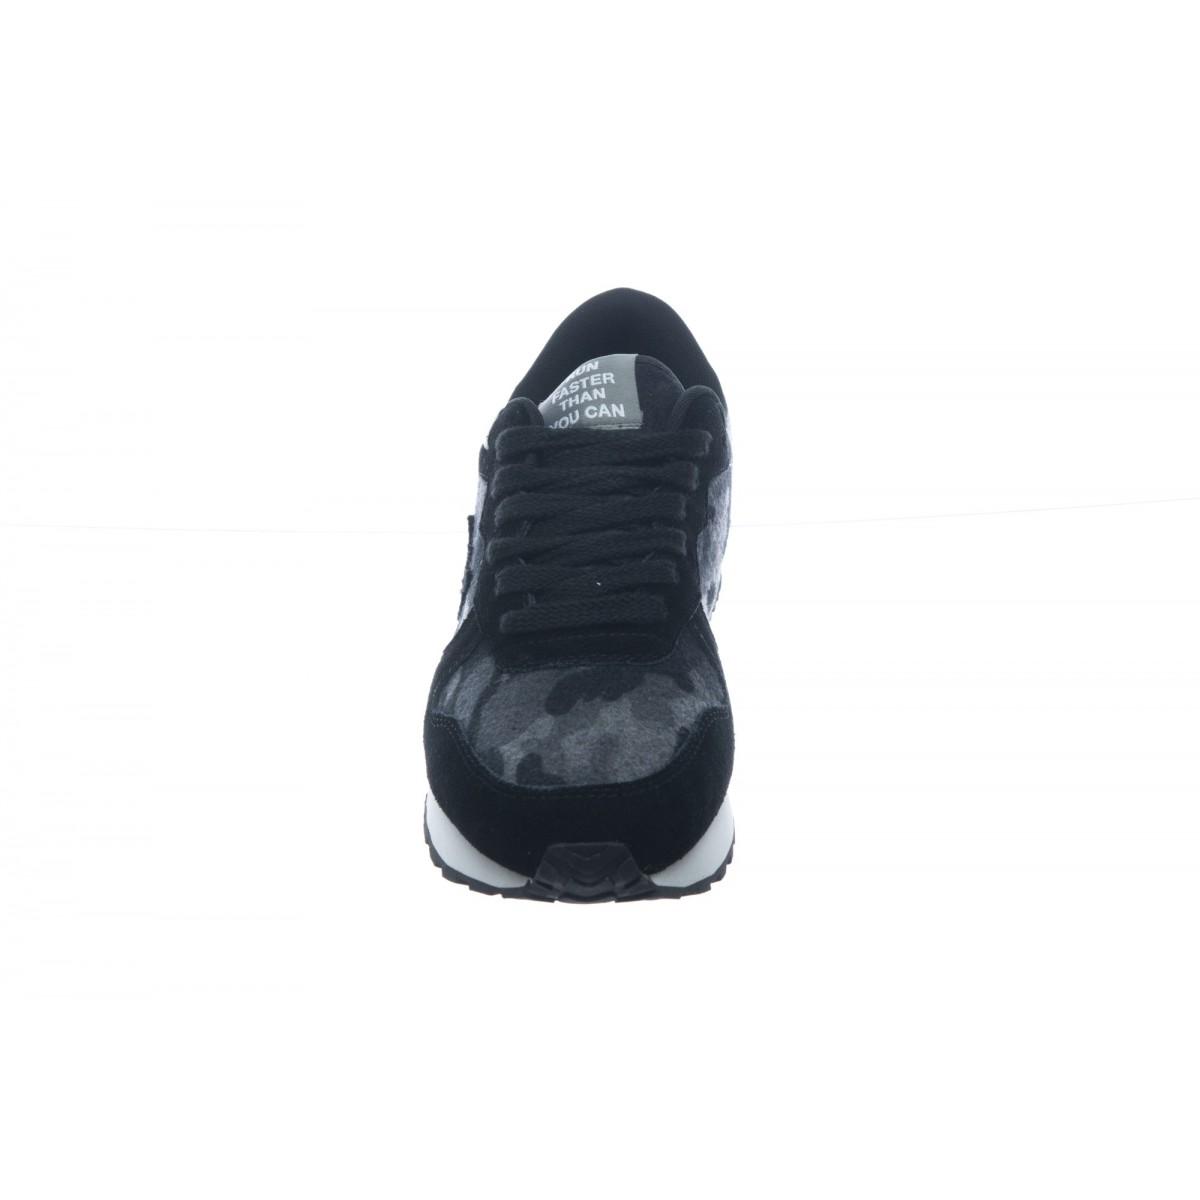 Scarpa - C2717 sneakers uomo